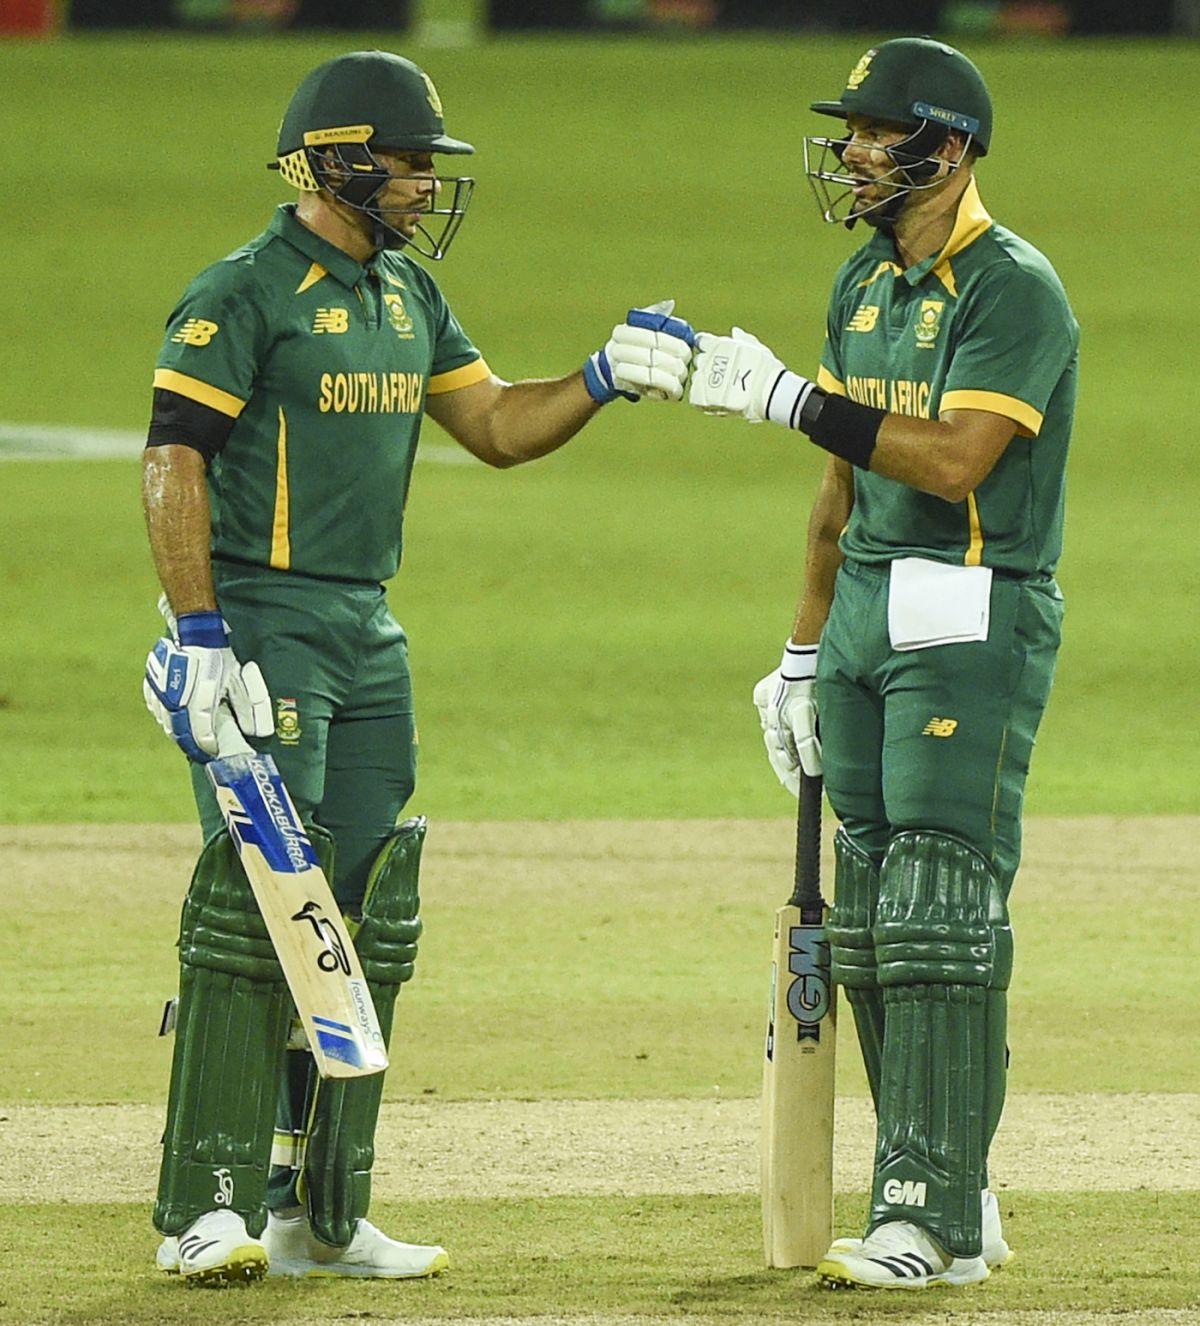 Aiden Markram and Janneman Malan gave South Africa a good start, Sri Lanka vs South Africa, 1st ODI, Colombo, September 2, 2021